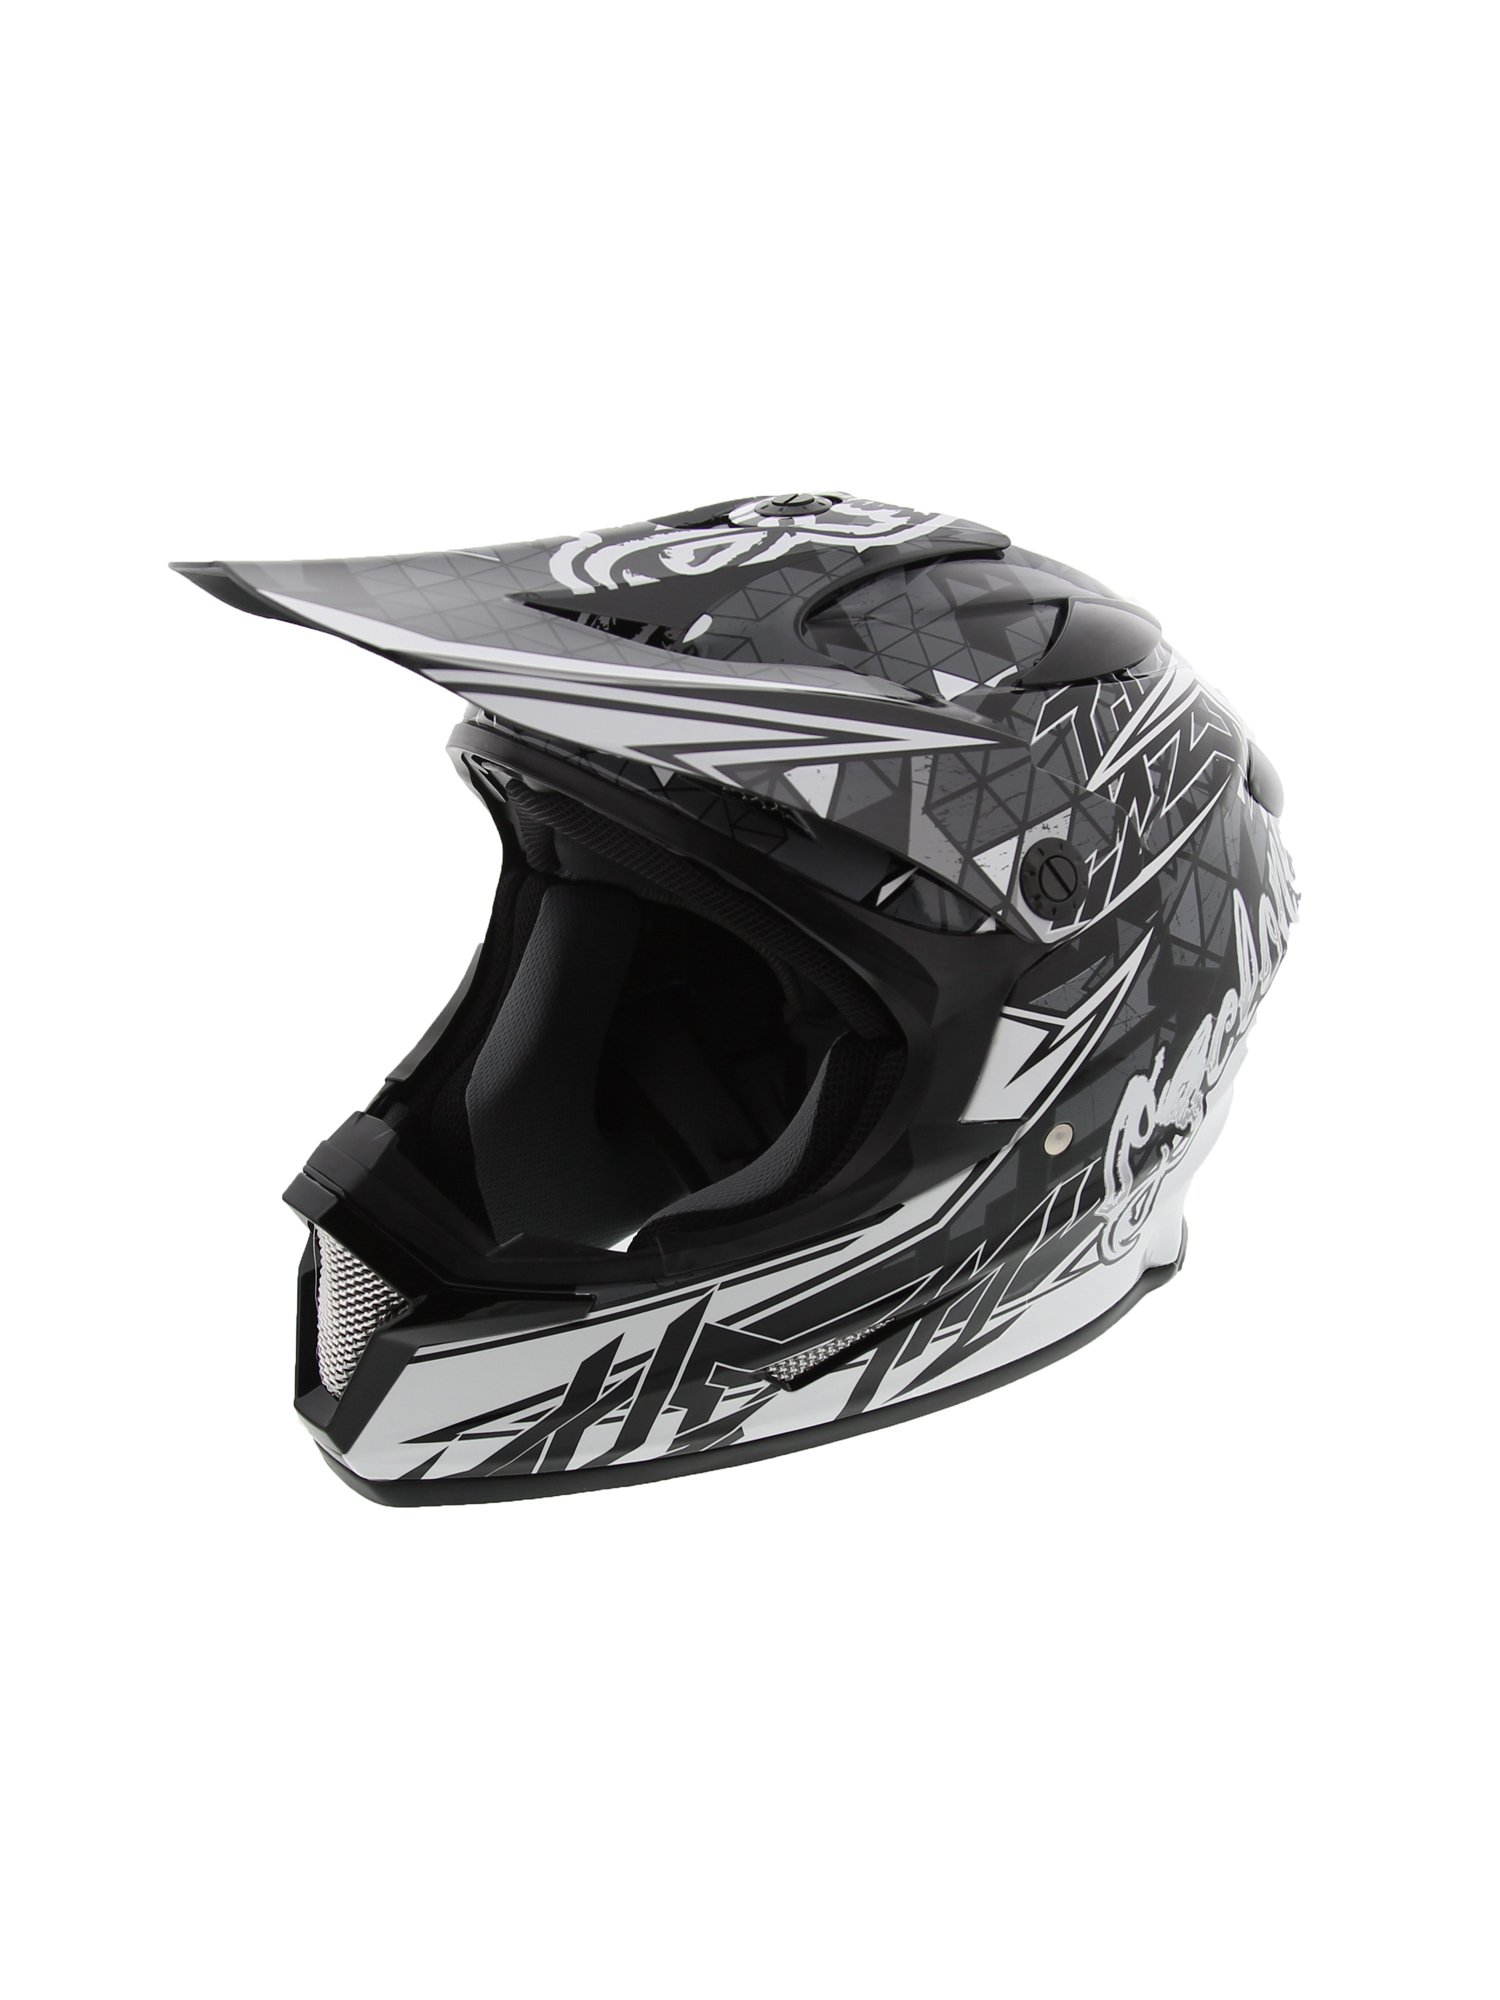 Cyclone ATV MX Dirt Bike Off-Road Helmet DOT/ECE Approved - Black/White - XXL